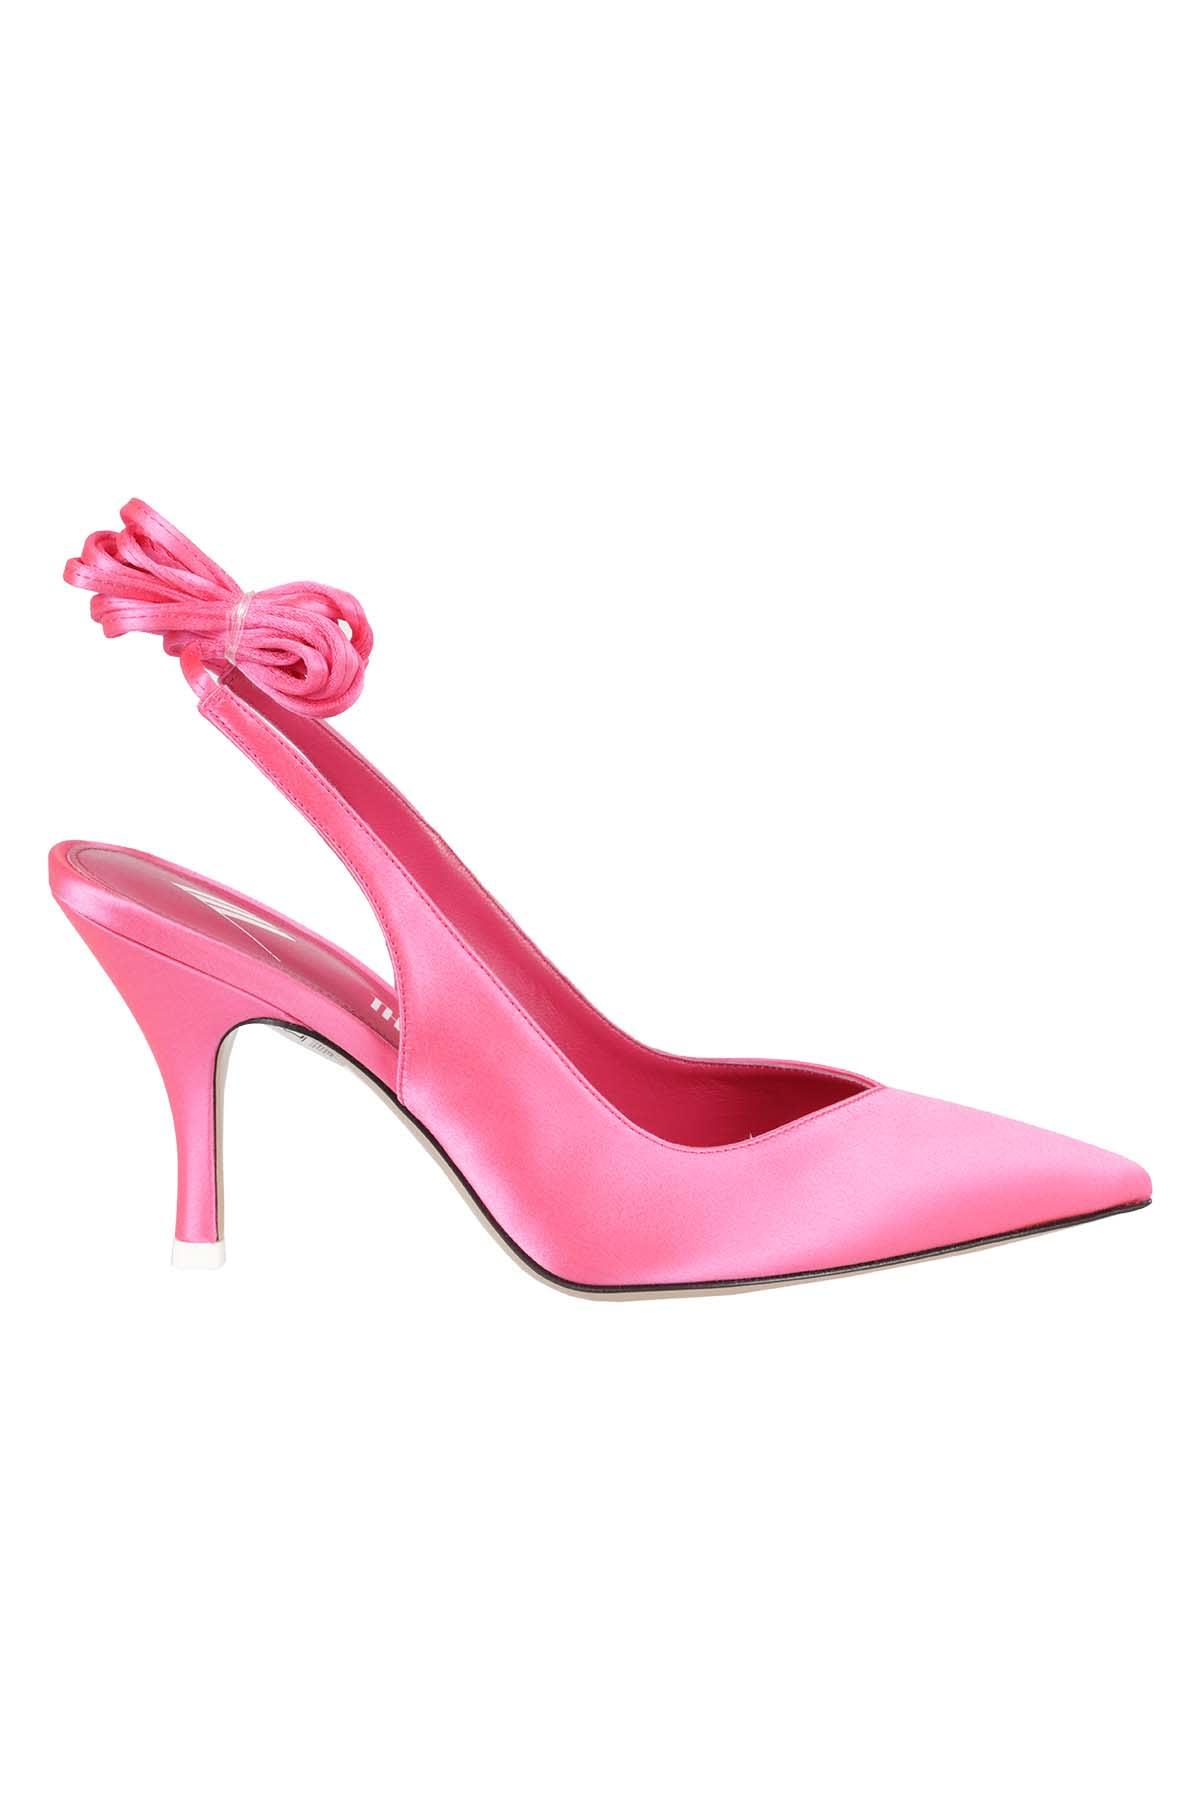 The Attico High-heeled shoe